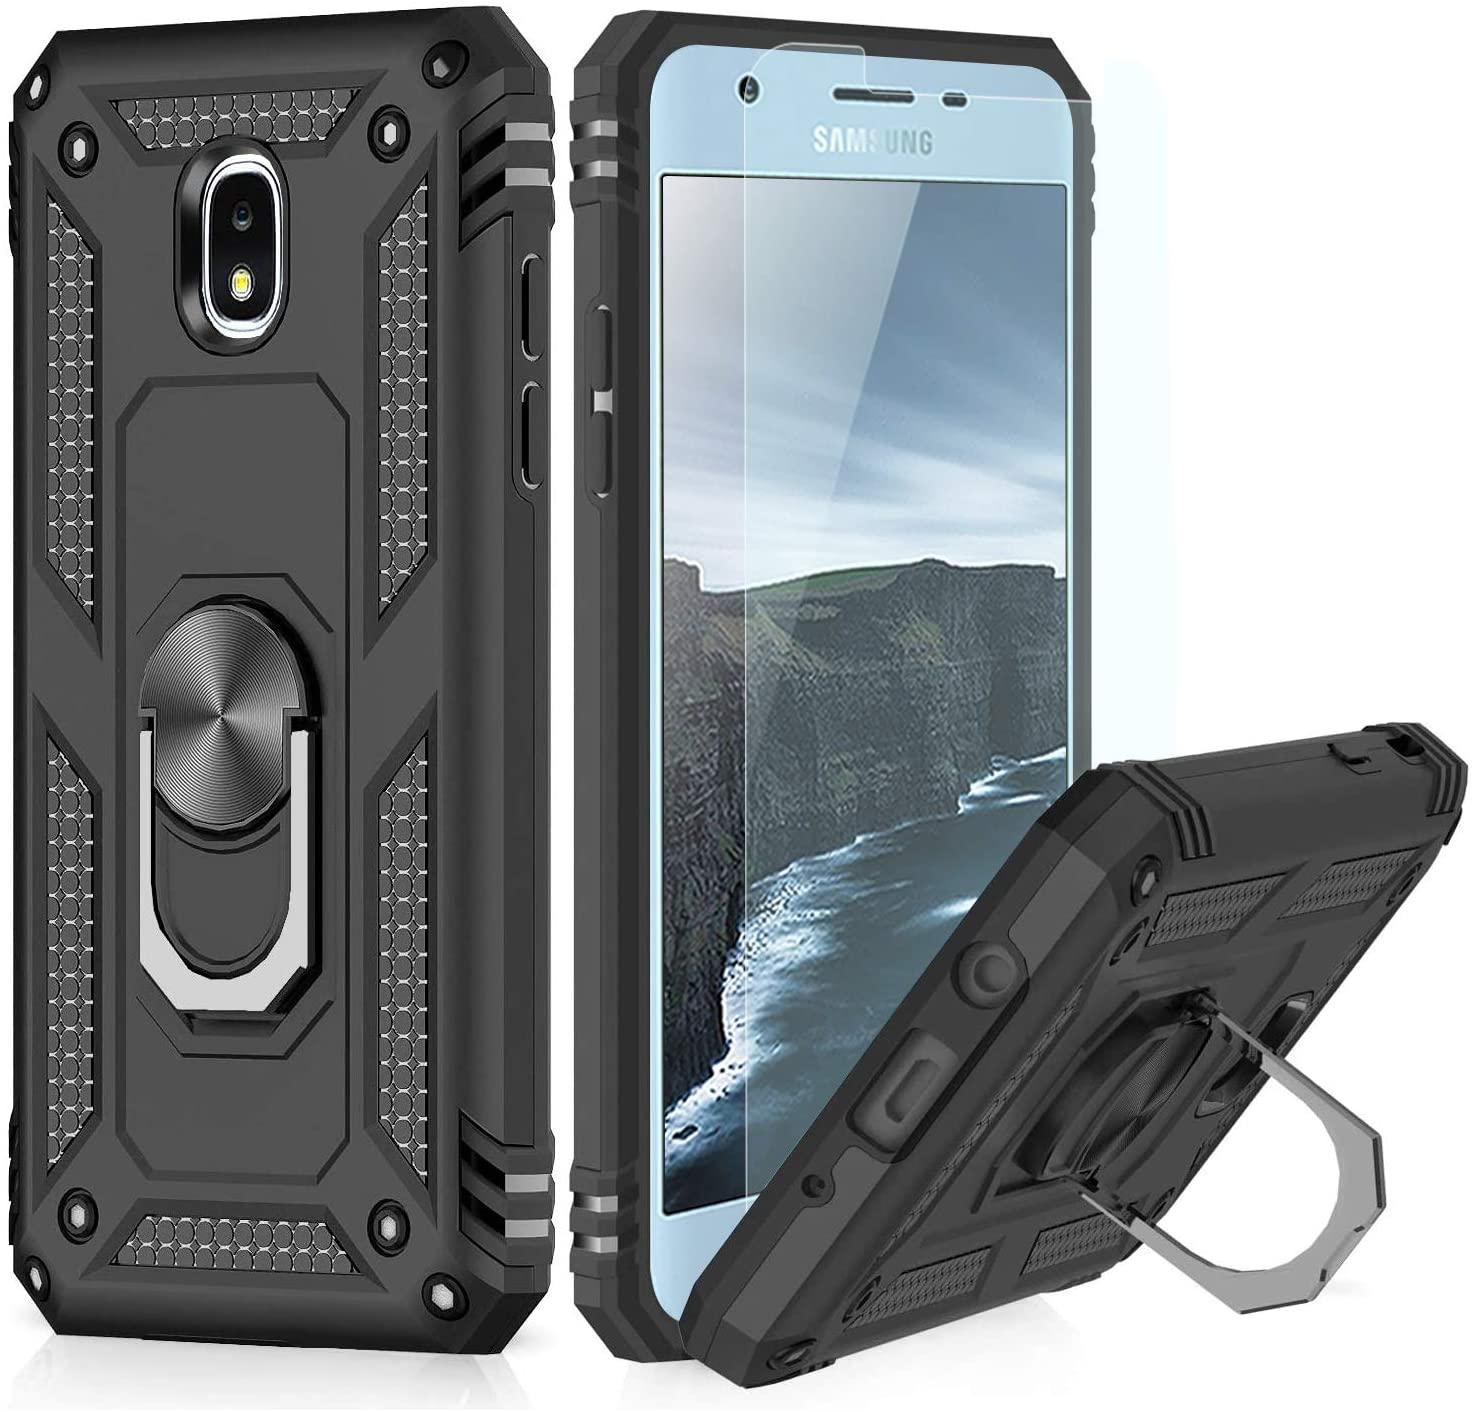 TJS Phone Case Galaxy J3 2018/J3 V 2018/Express Prime 3/J3 Star/J3 Orbit/J3 Achieve/J3 Prime 2/Sol 3, with [Tempered Glass Screen Protector][Defender][Metal Ring][Magnetic Support] Armor Cover (Black)